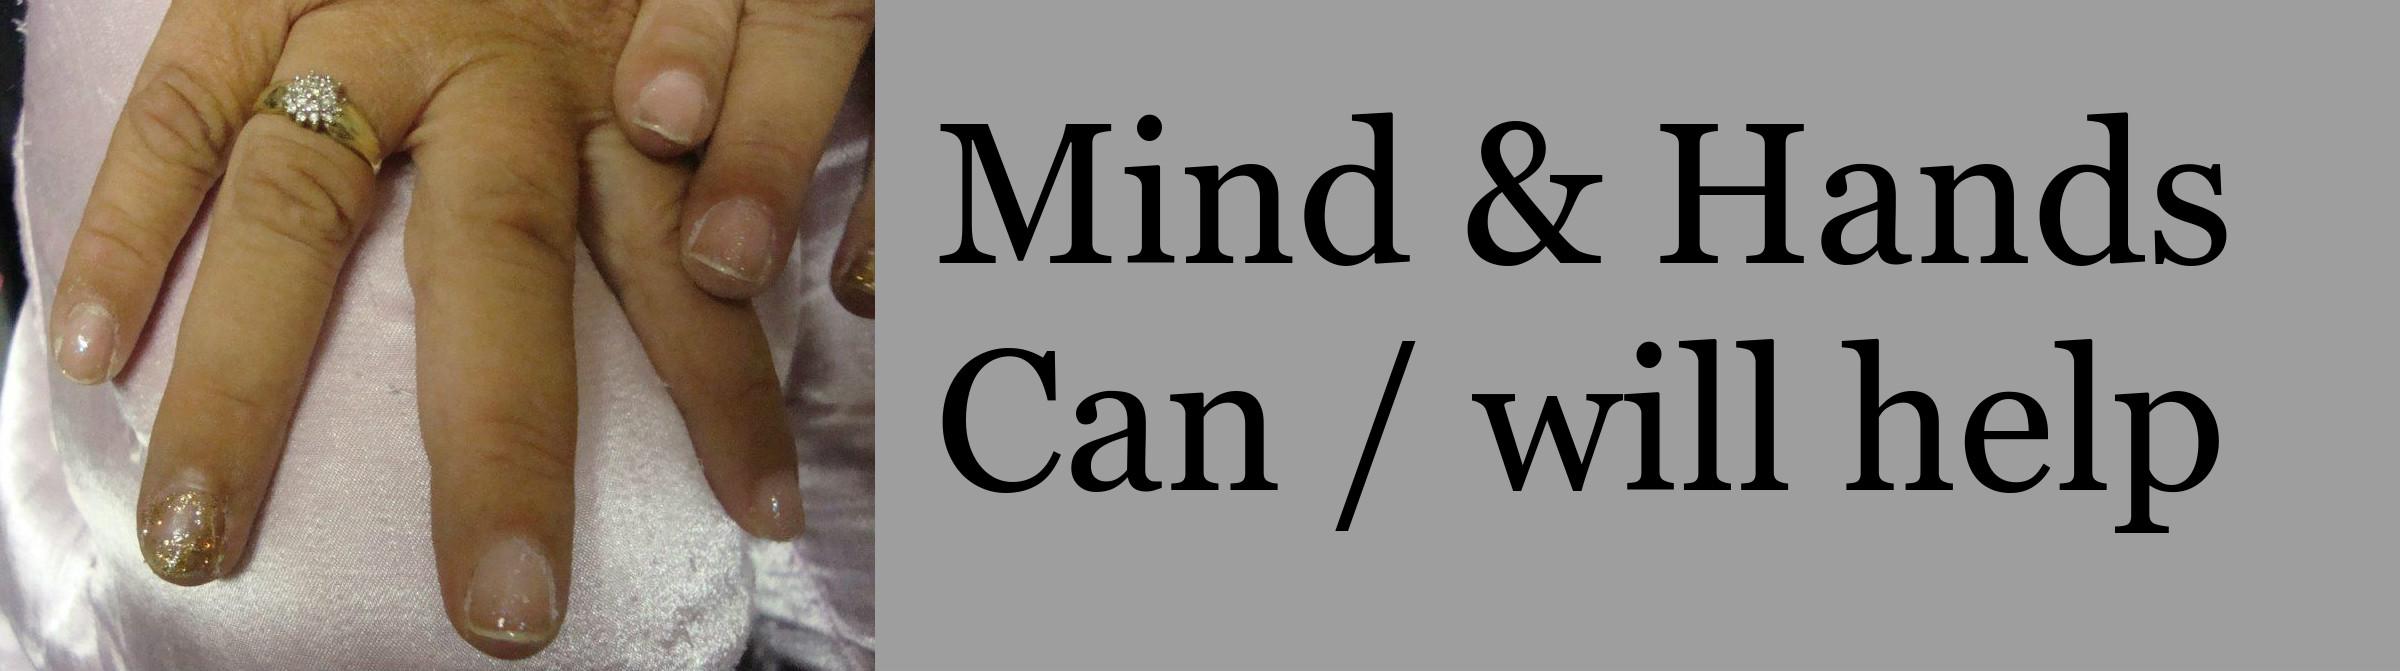 Mind & Hands